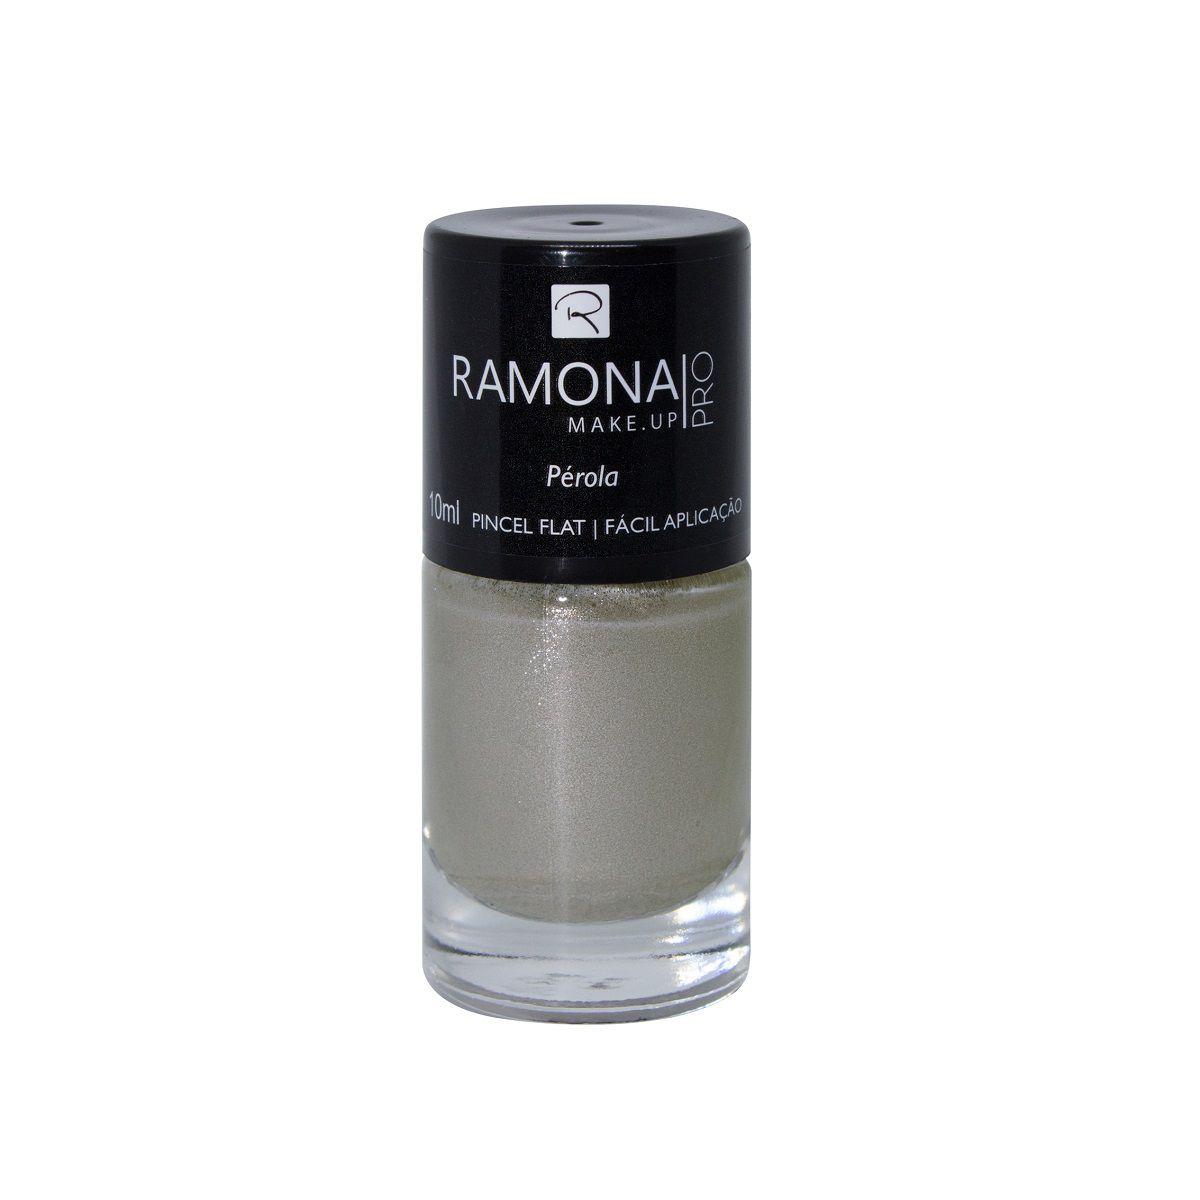 Esmalte cintilante Ramona Cosméticos Pérola 10ml